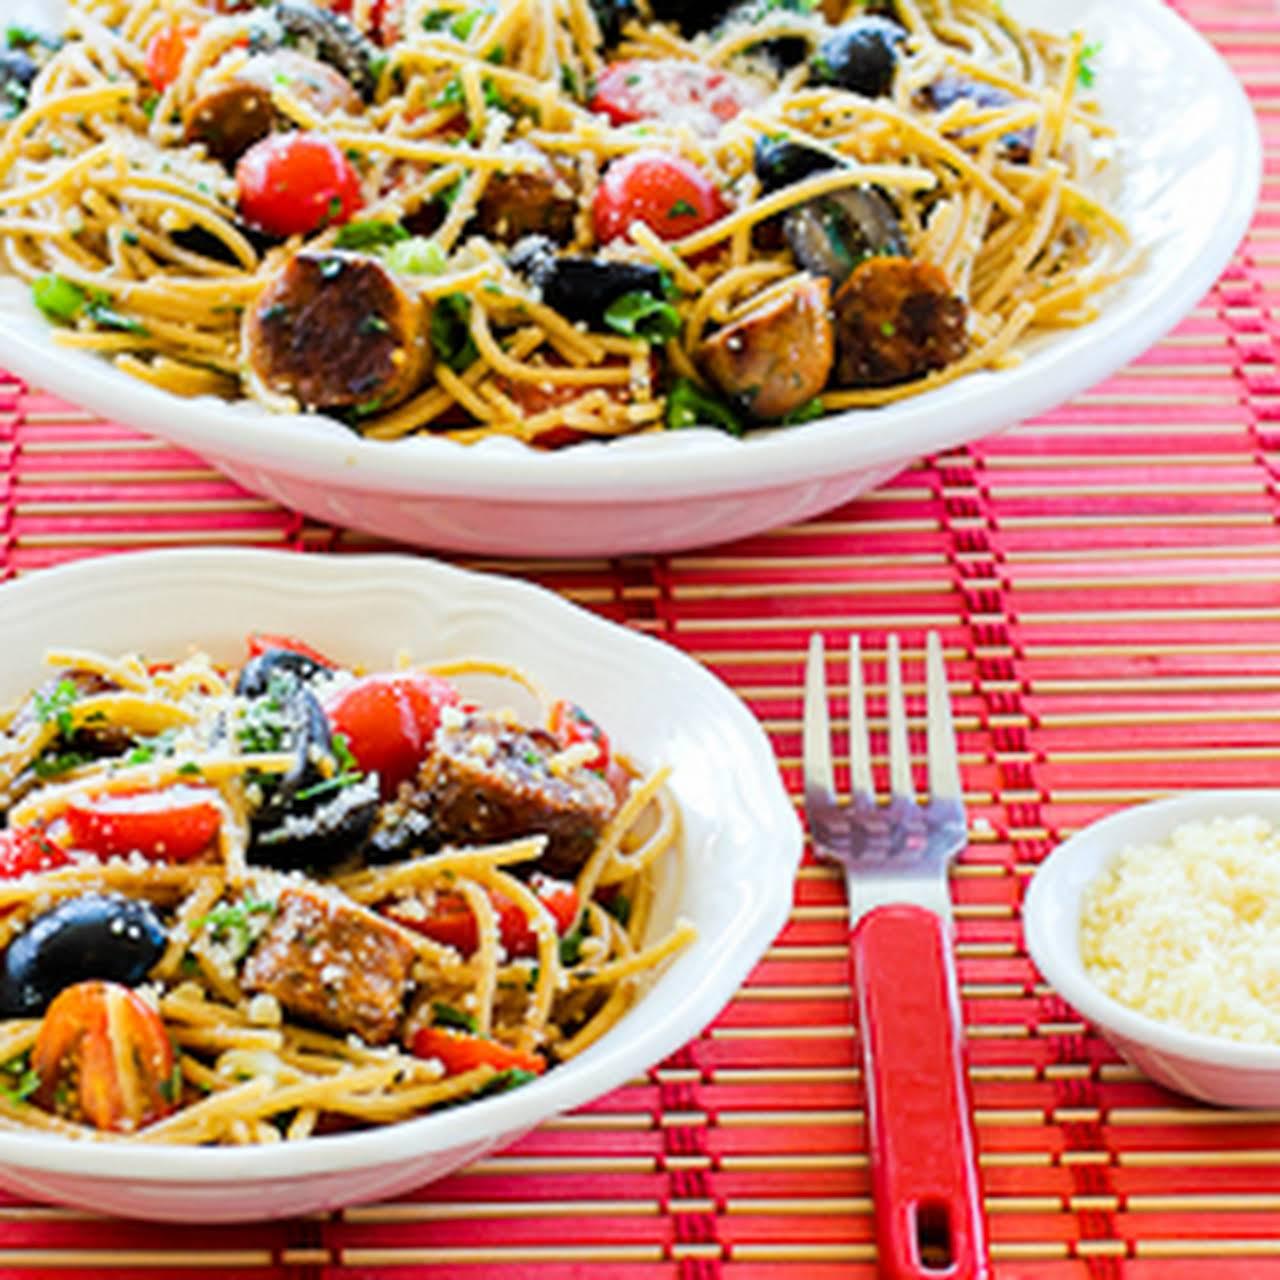 Whole Wheat Spaghetti Salad  as soon as Italian Sausage, Tomatoes, Olives, and Basil Vinaigrette